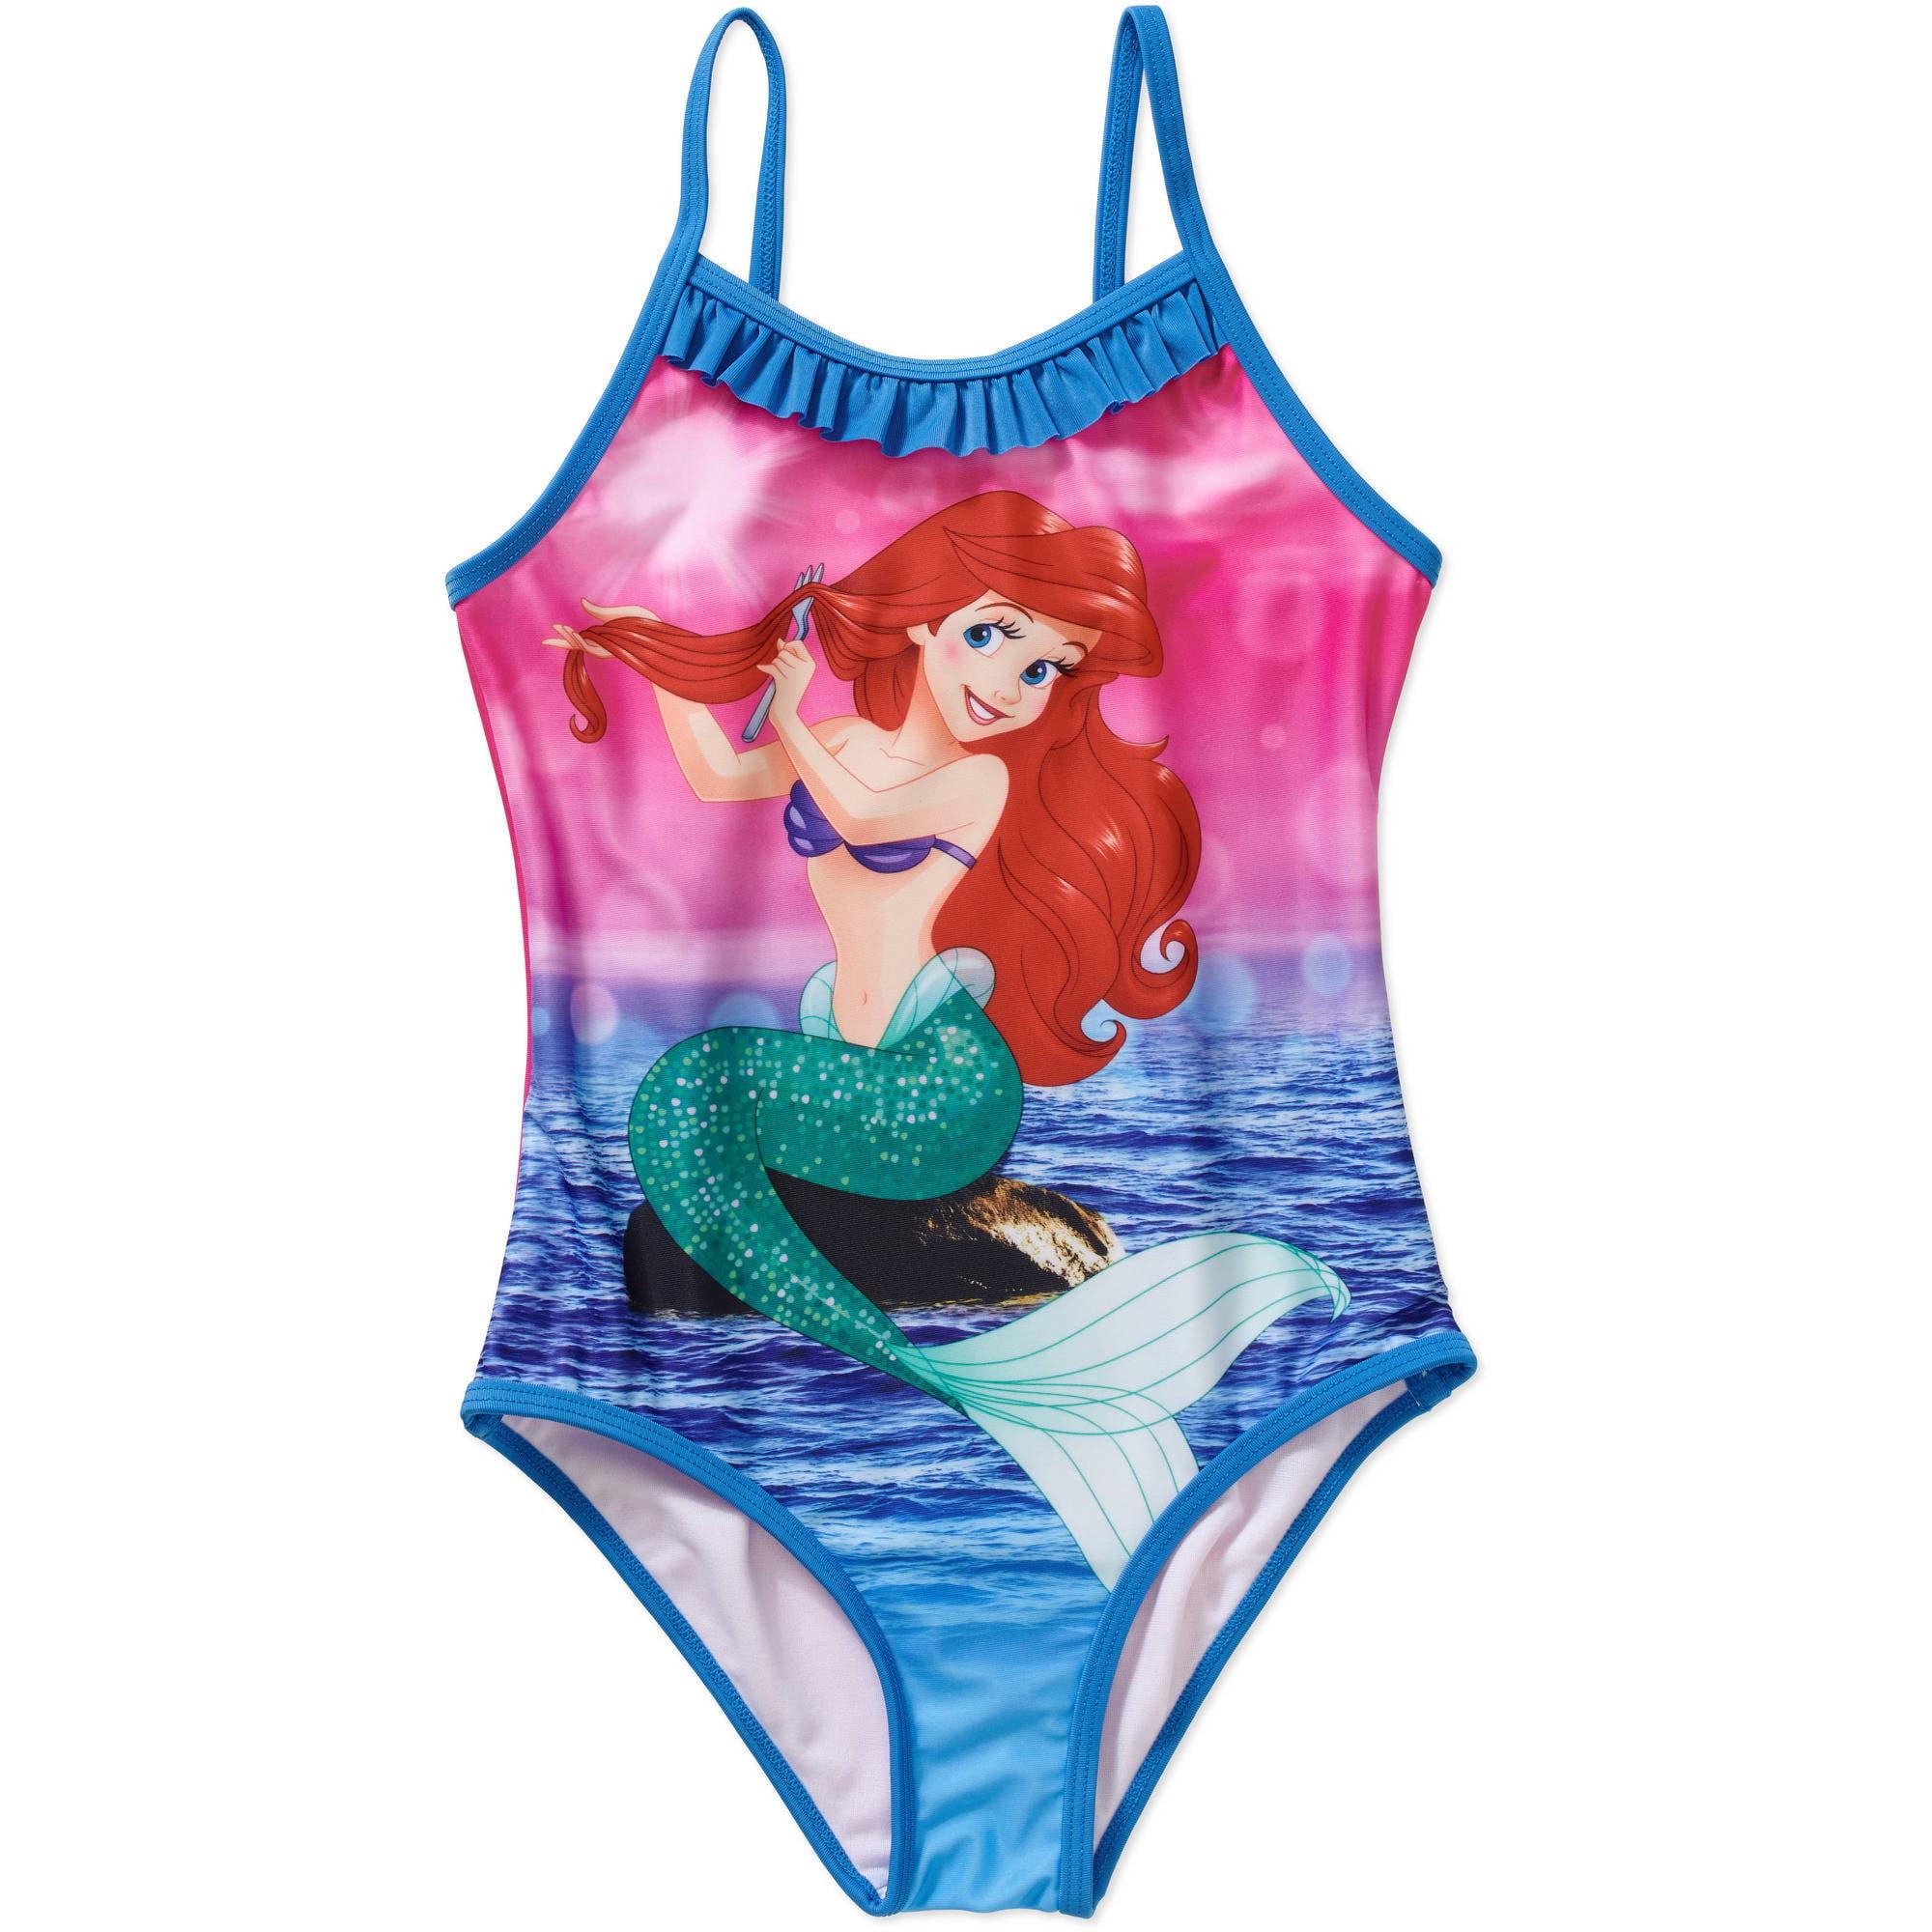 Disney Princess Little Mermaid Ariel Girls' One Piece Swimsuit